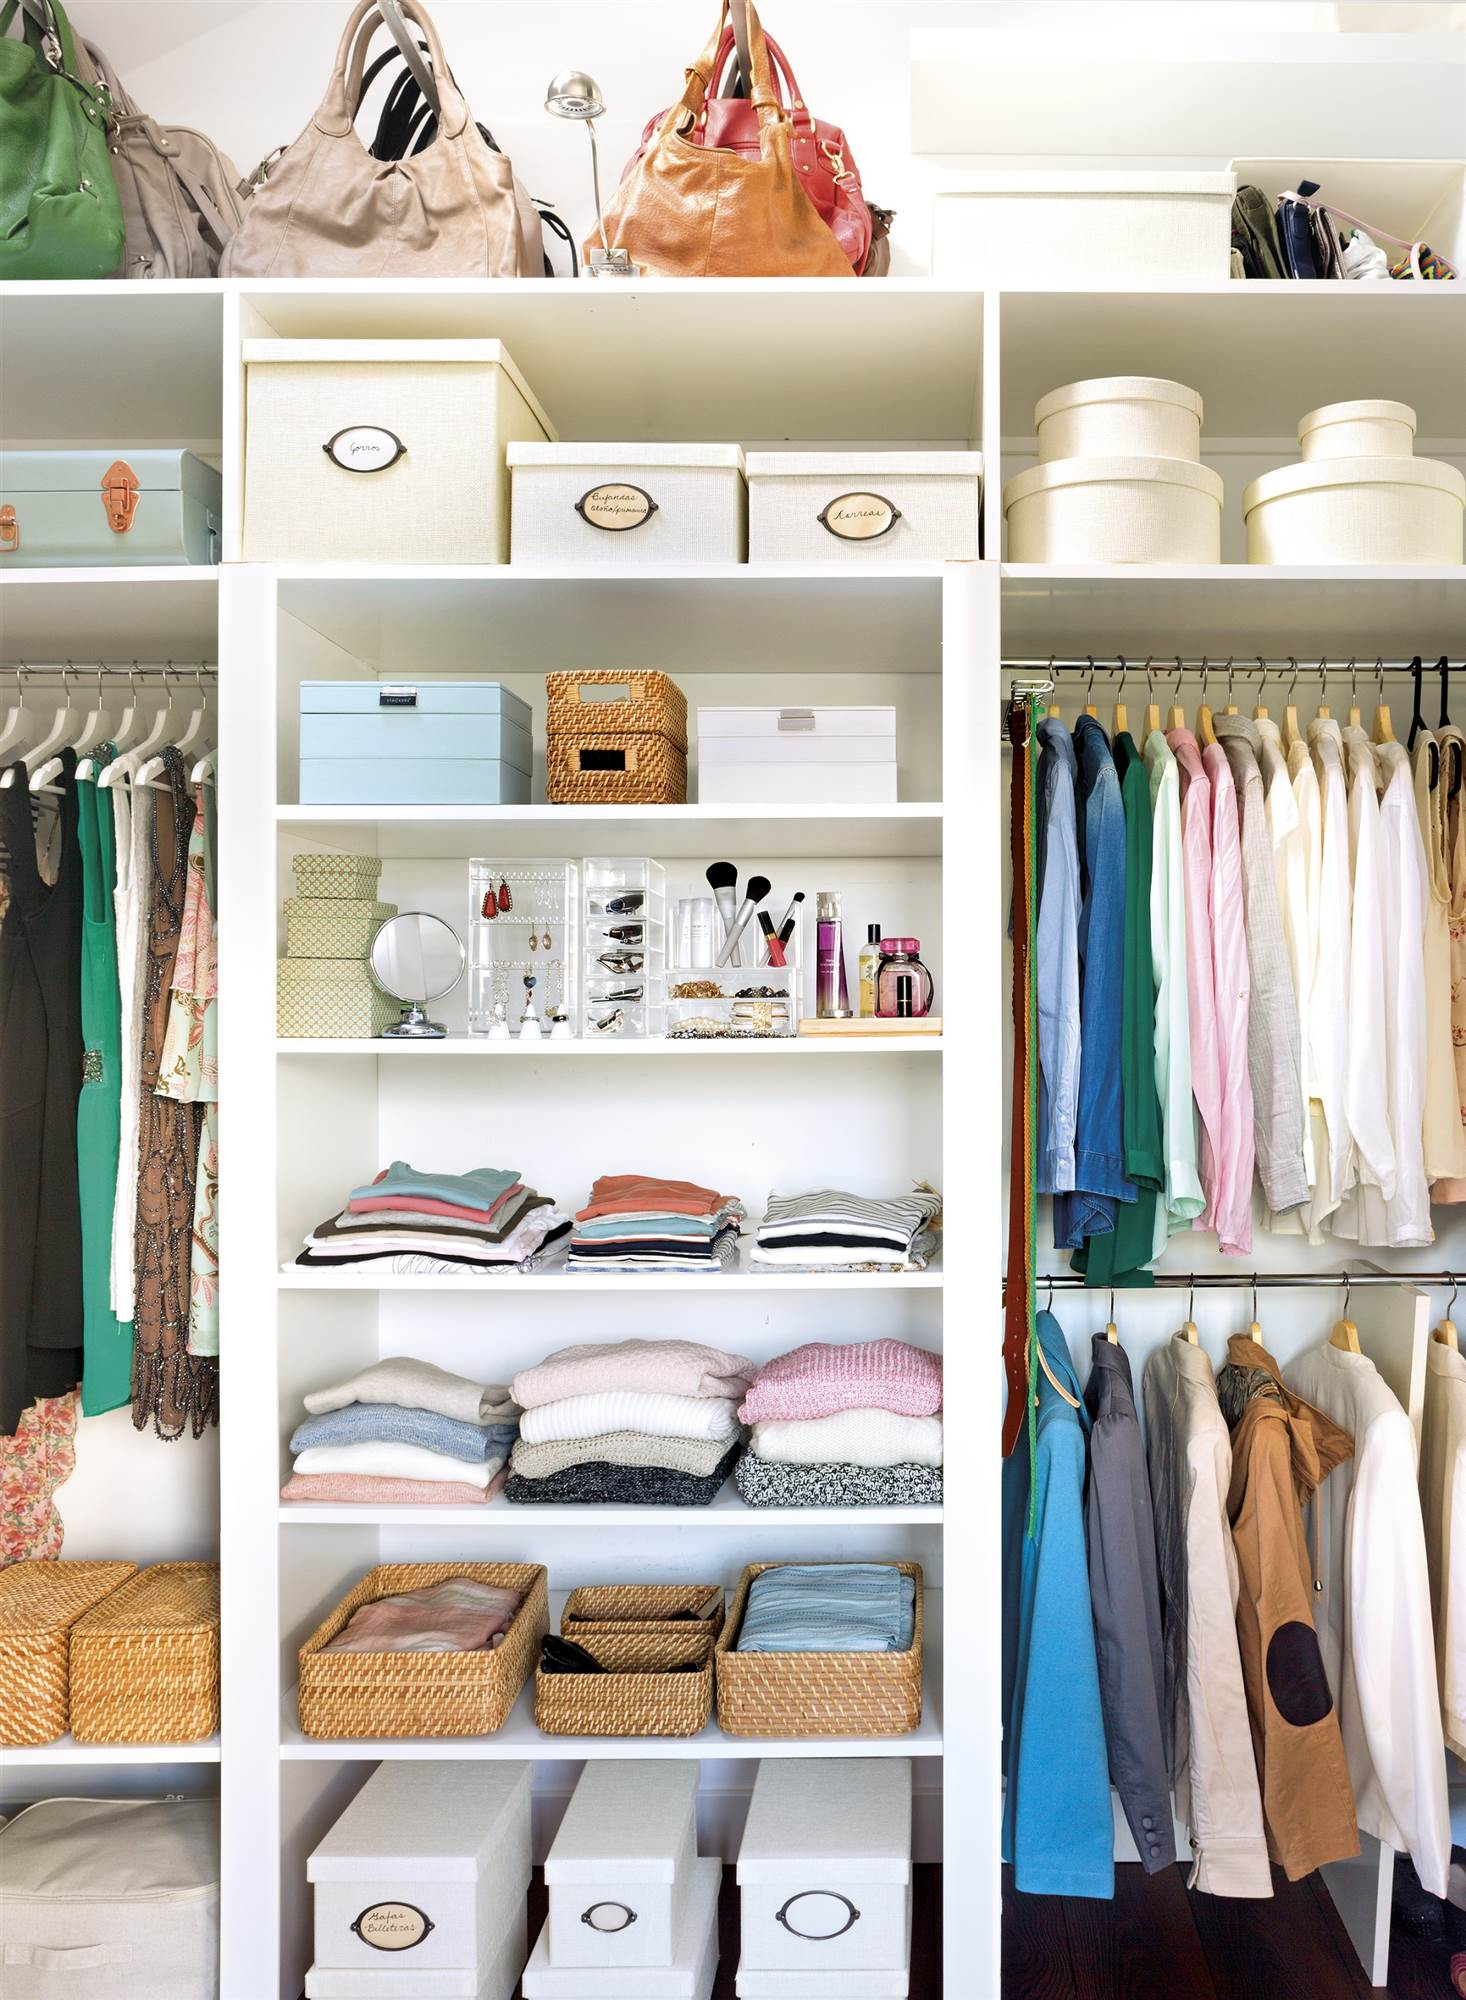 C mo ordenar el armario paso a paso - Como organizar un armario empotrado pequeno ...